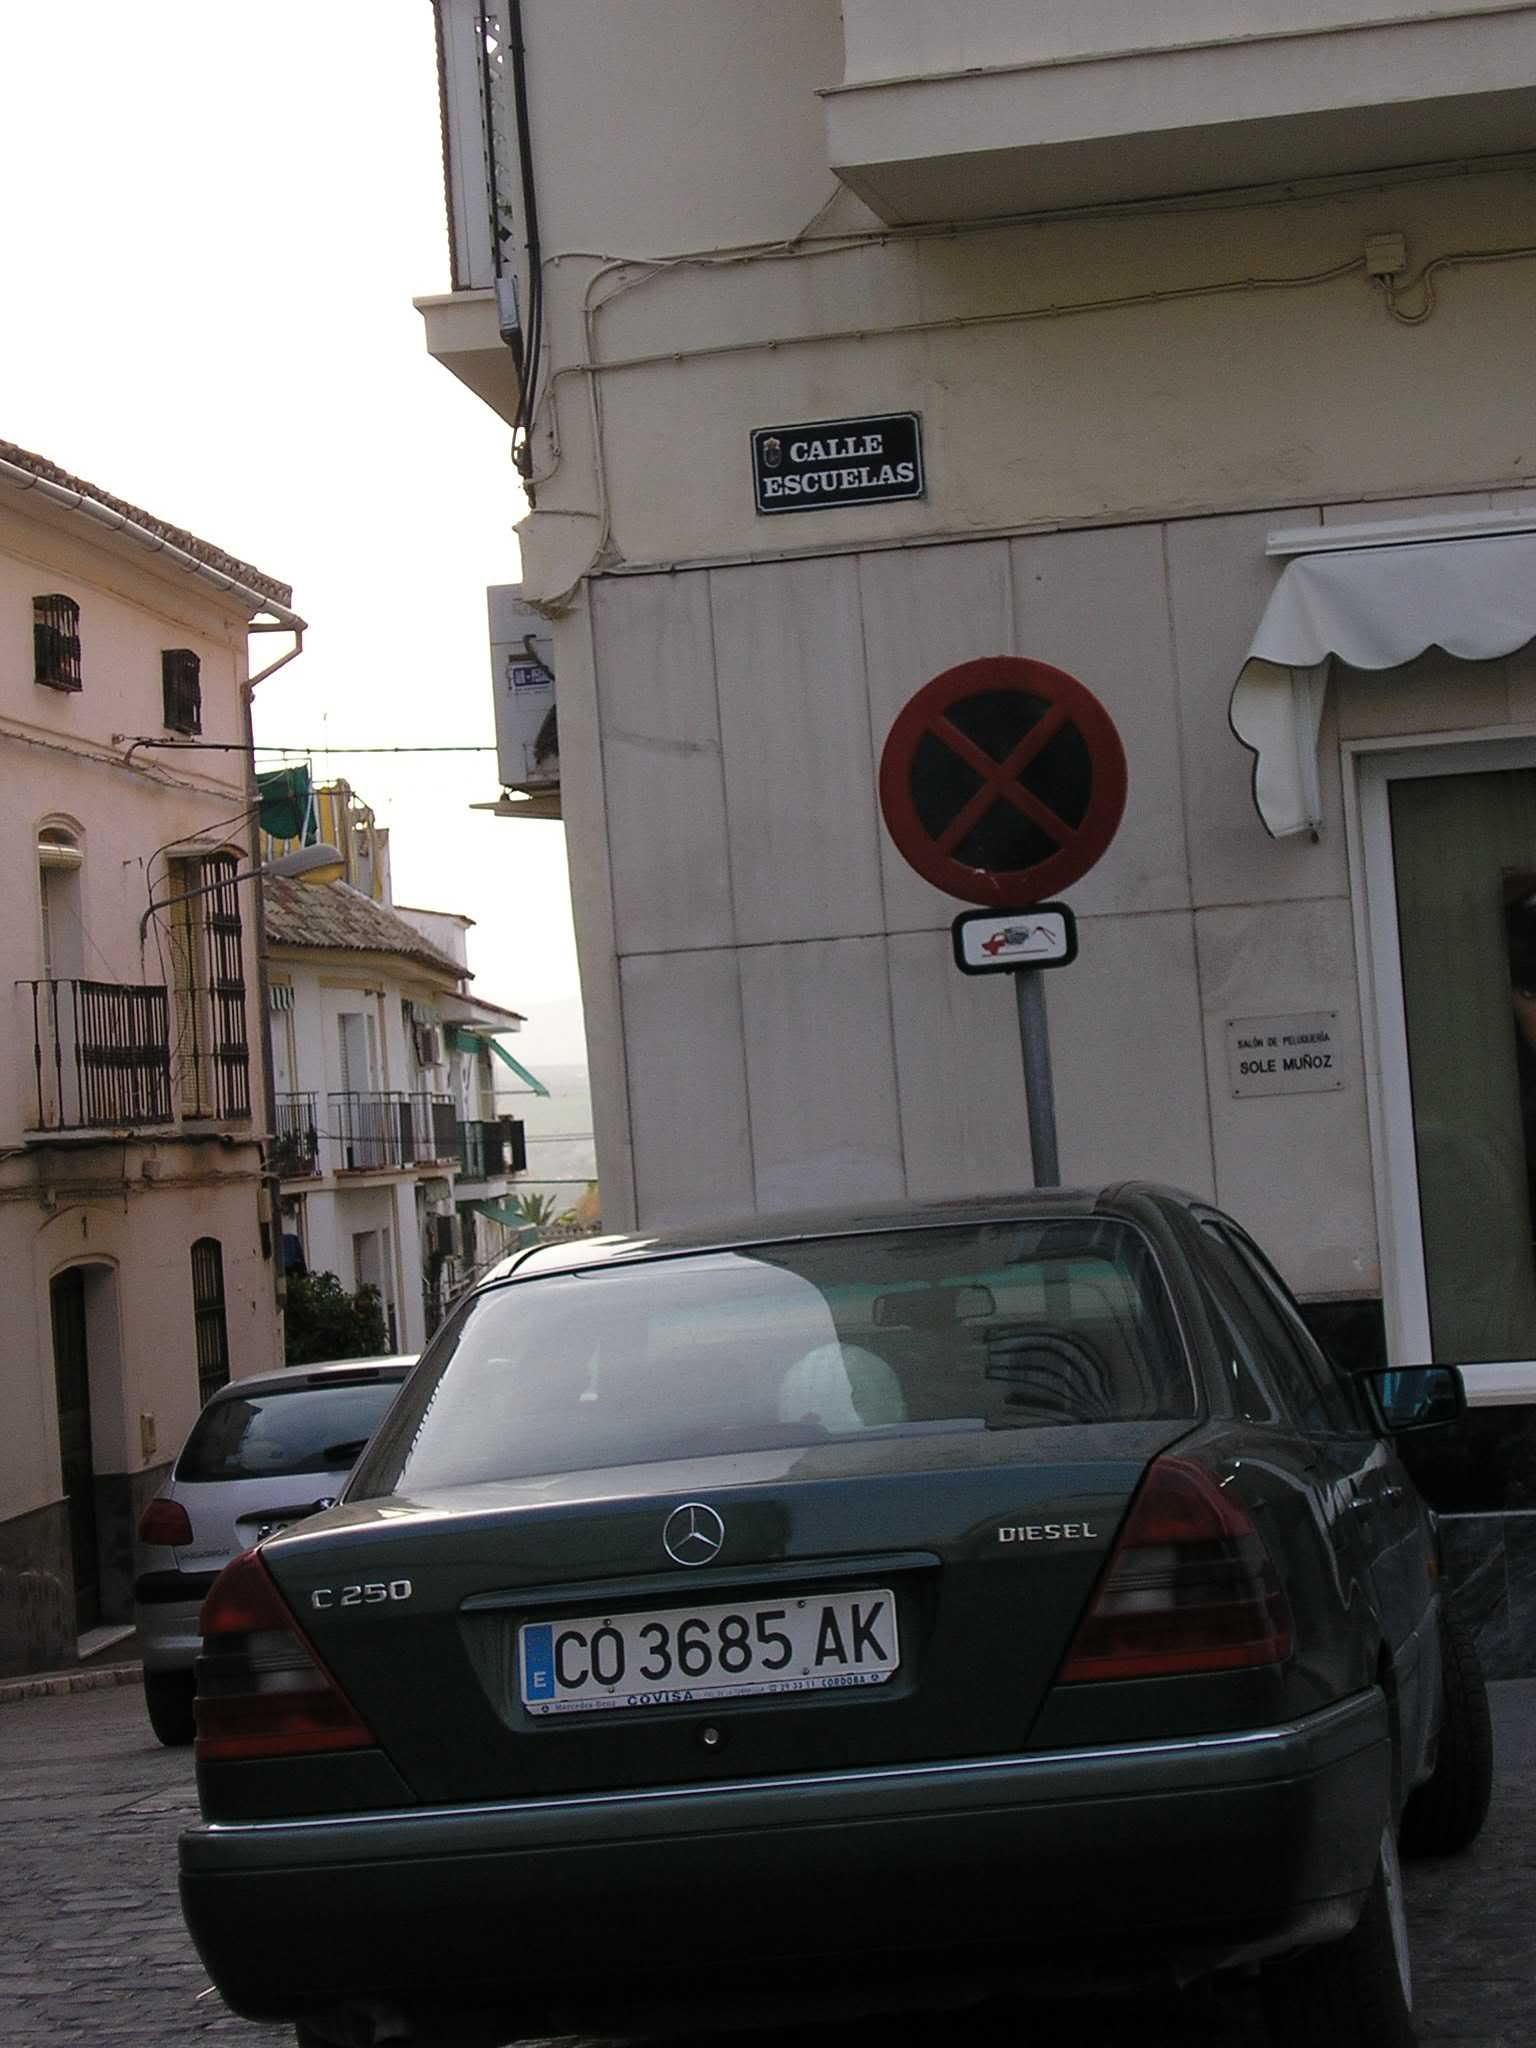 Mercedes en calle escuelas